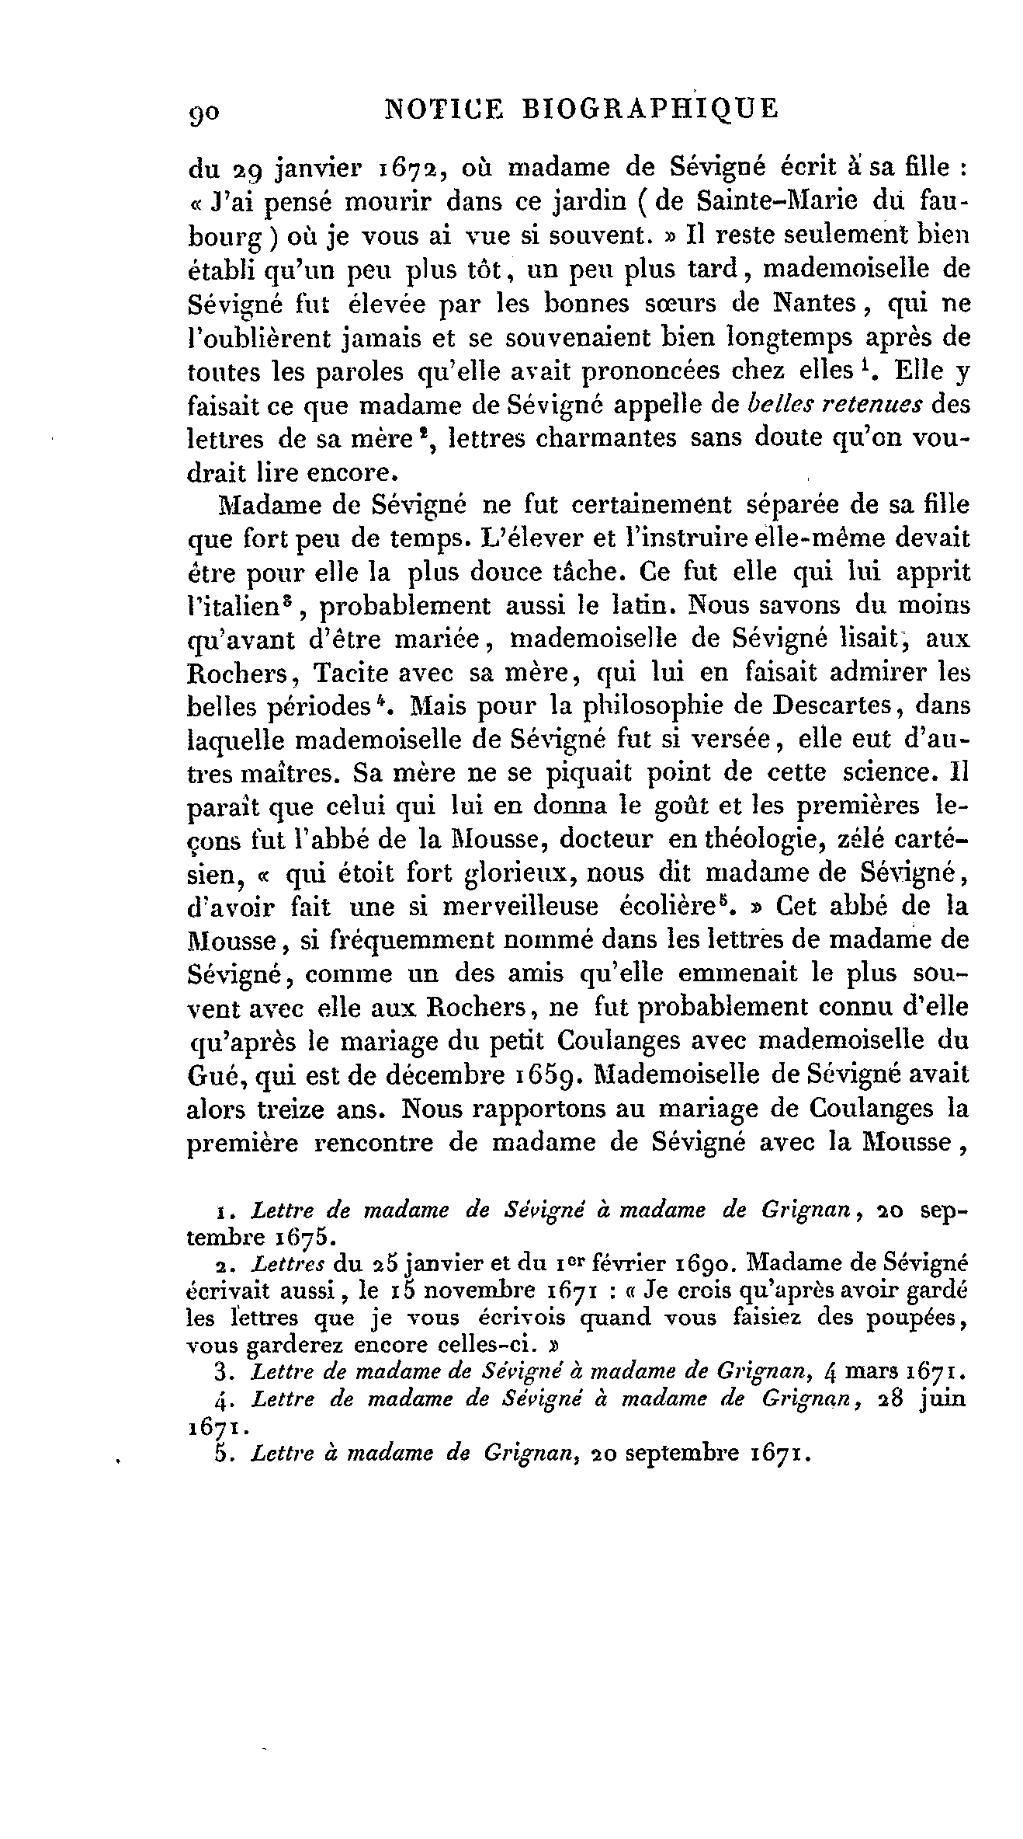 lettre de madame de grignan a sa mere